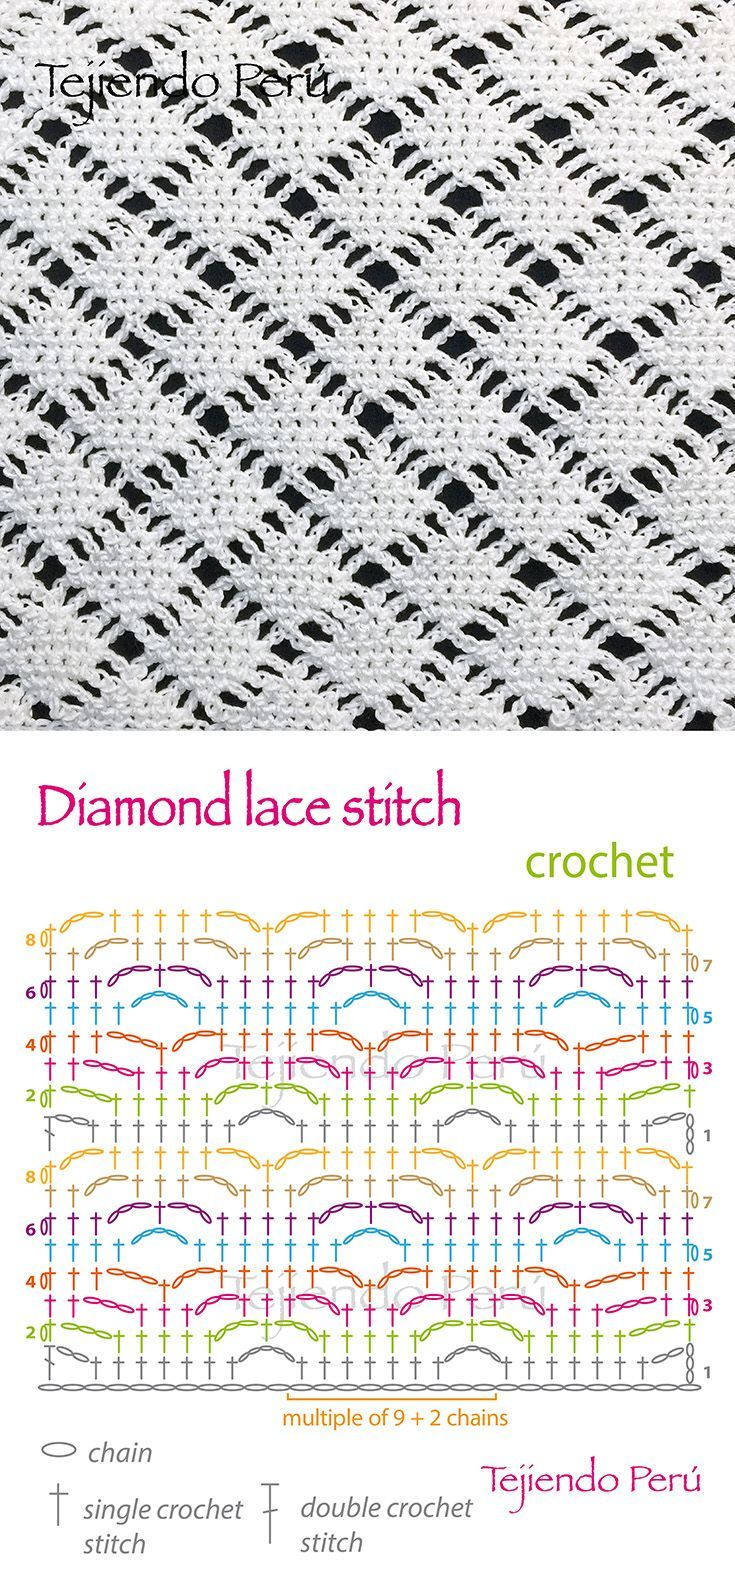 Lacey Crochet Pattern Diagram Opinions About Wiring Diamond Lace Stitch Pinterest Rh Com Au Top Patterns Stitches